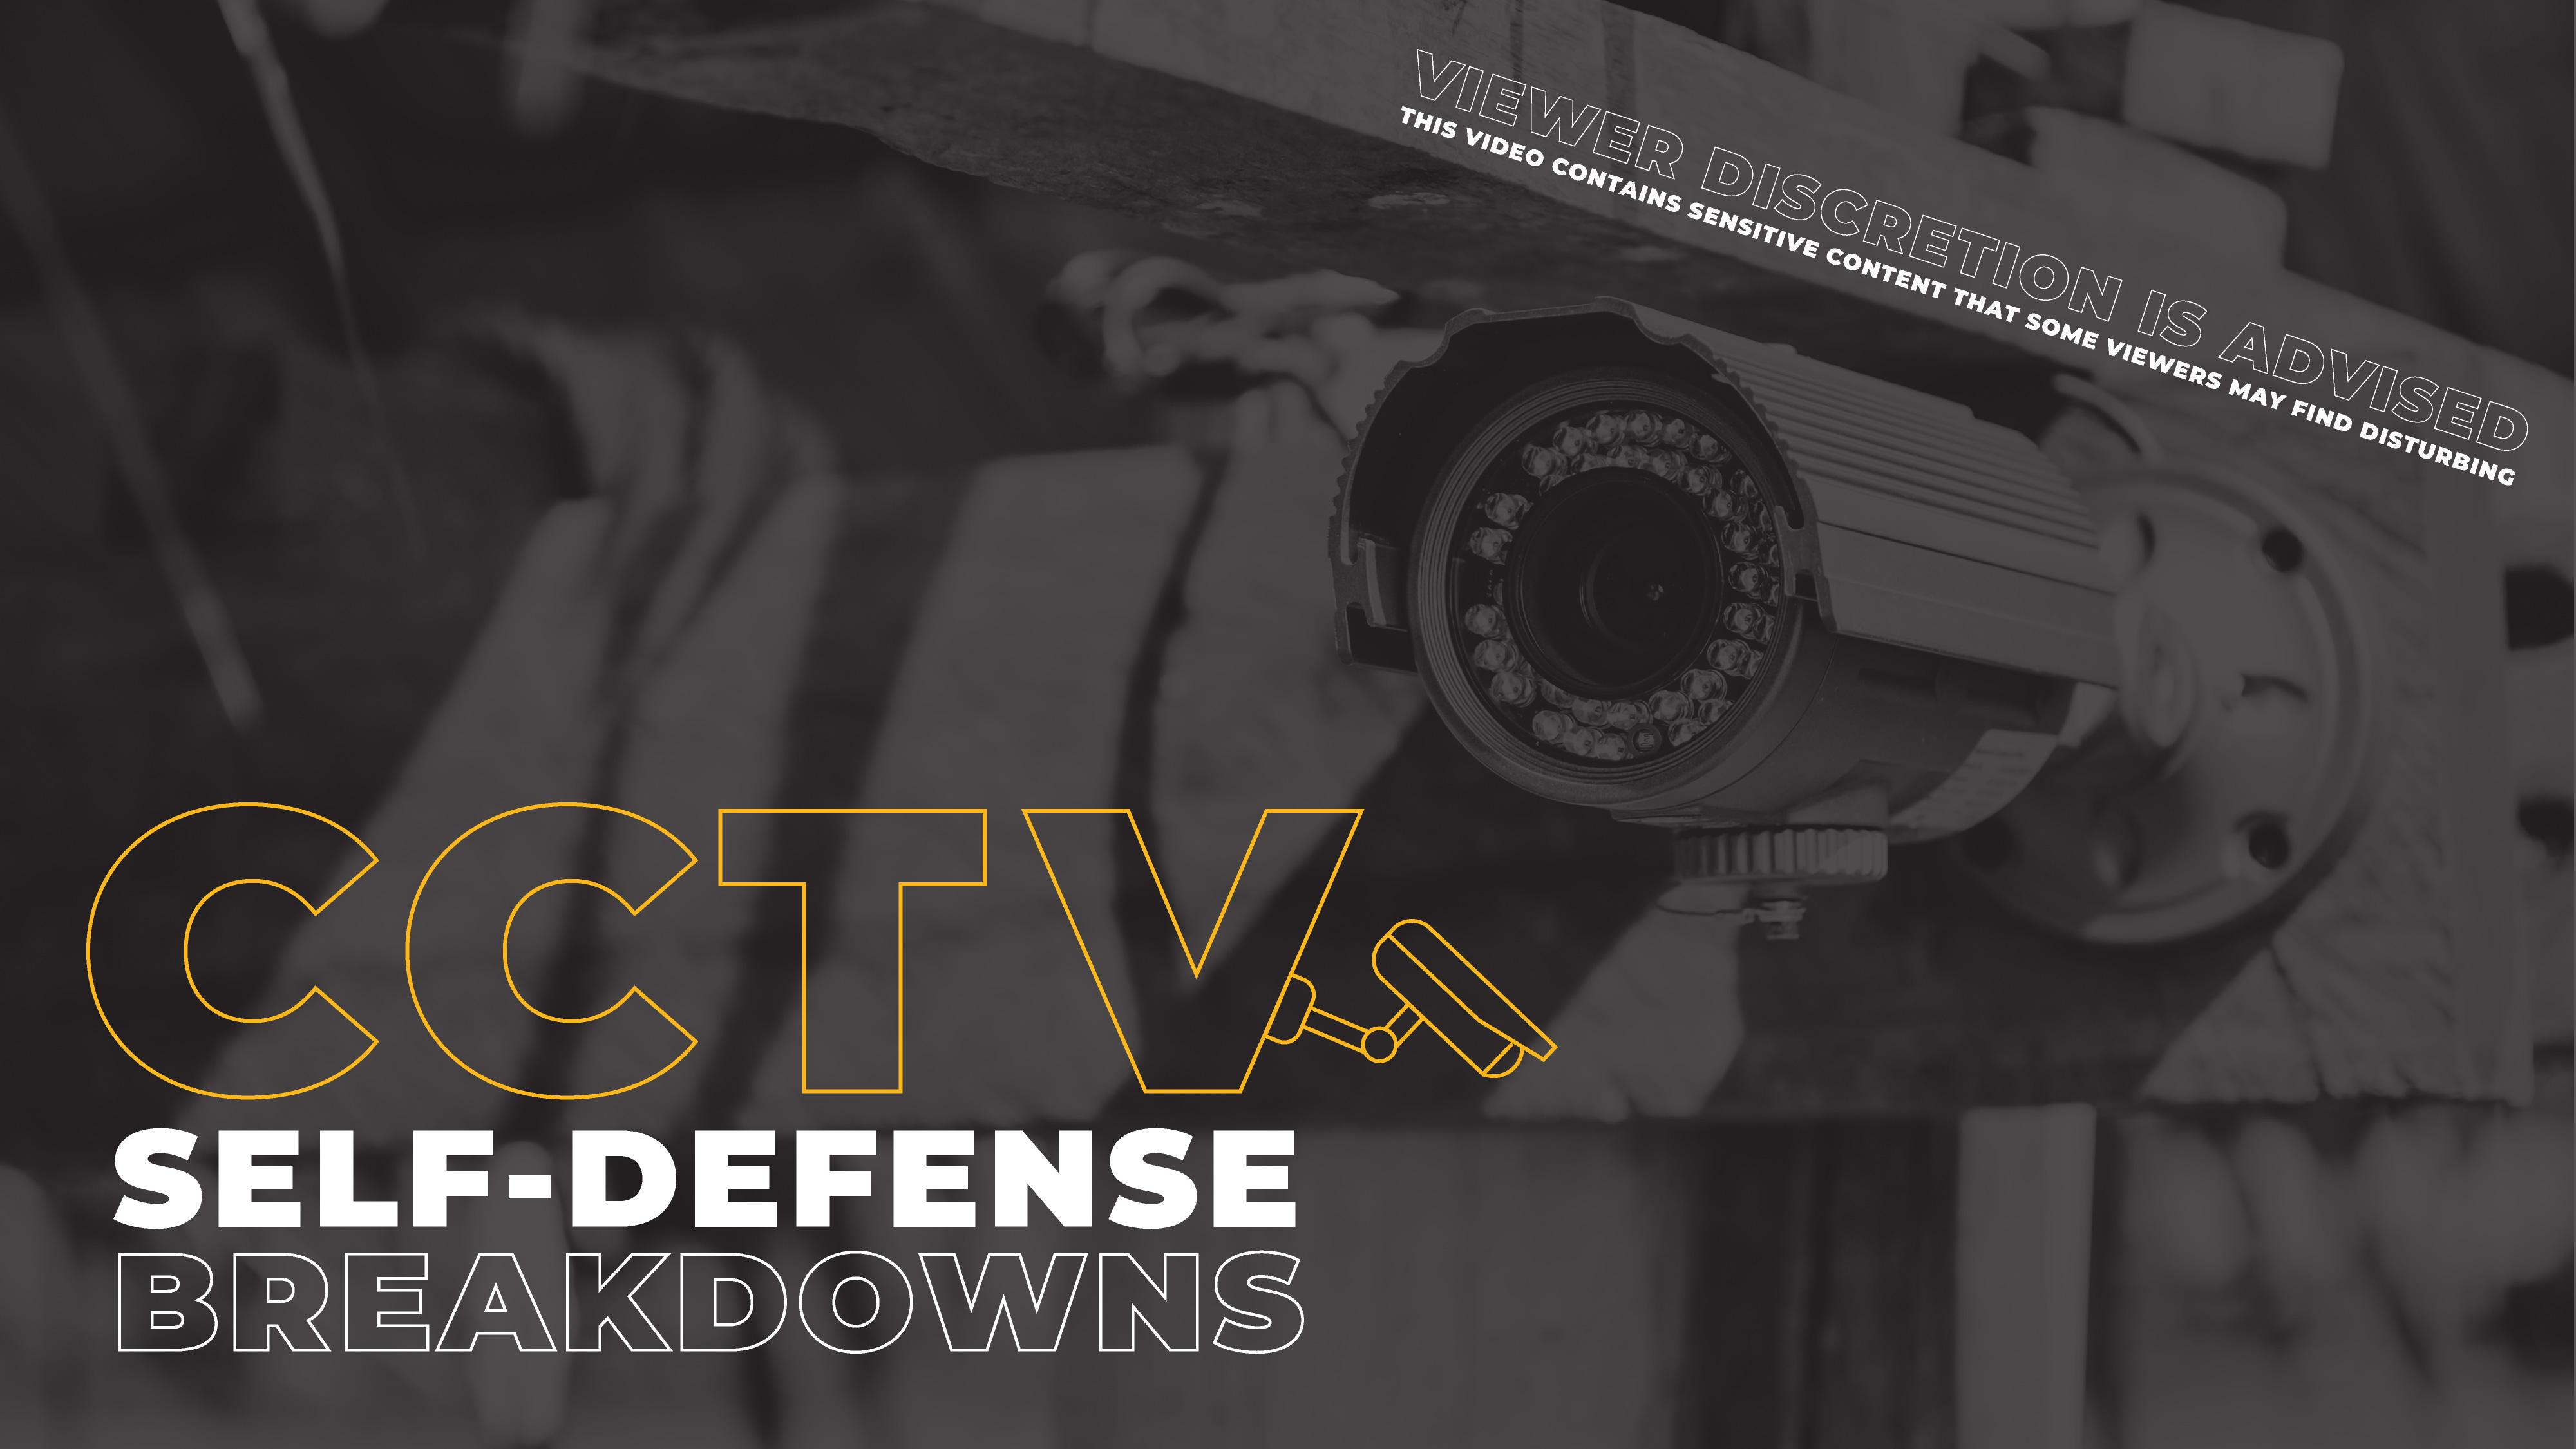 Self-Defense Crime Breakdowns